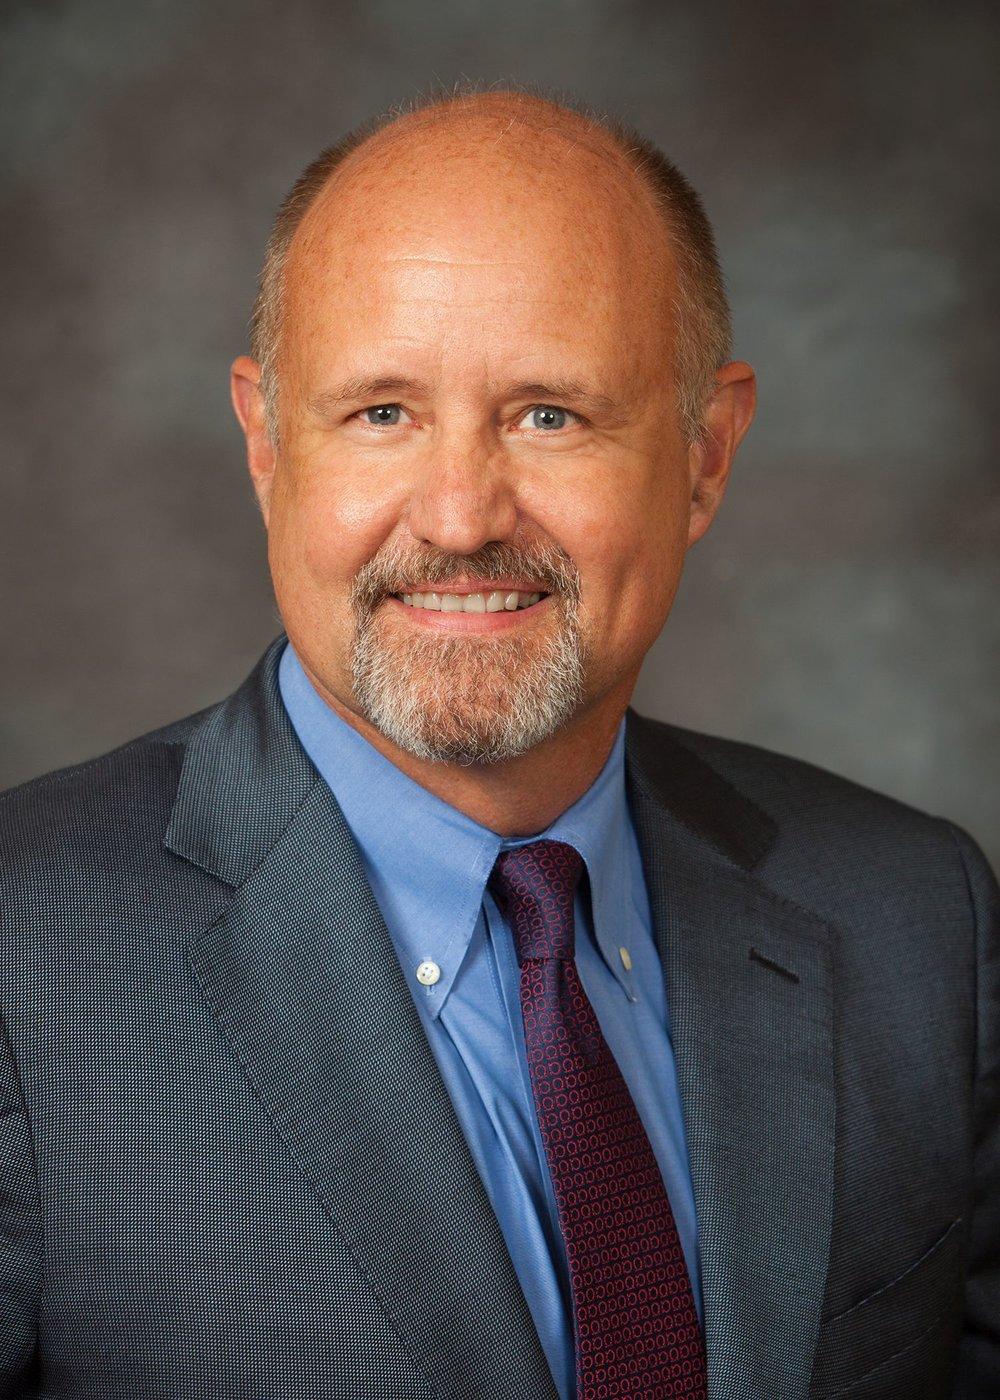 Philip Adamson (Abbott, USA)